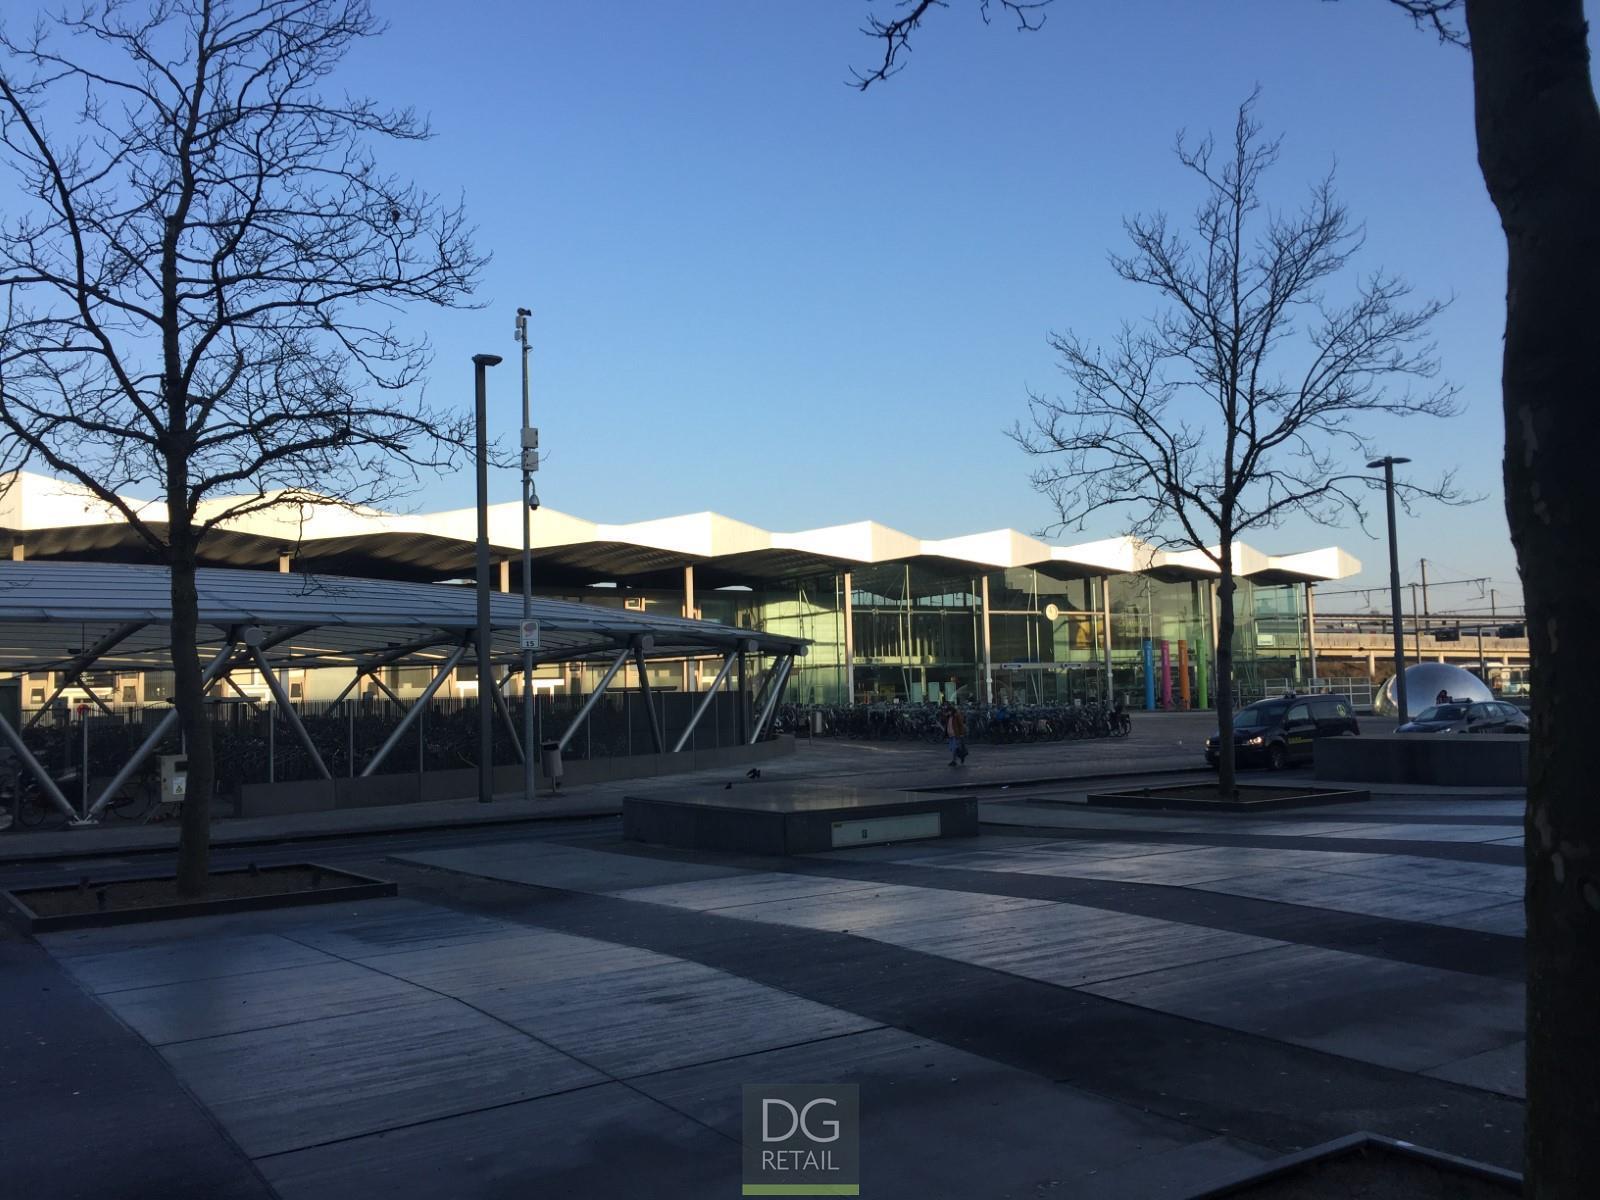 commercieel gelijkvloers te koop 'Plaza Express' (R1131)  - Stationsplein  , 9100 Sint-Niklaas, België 5